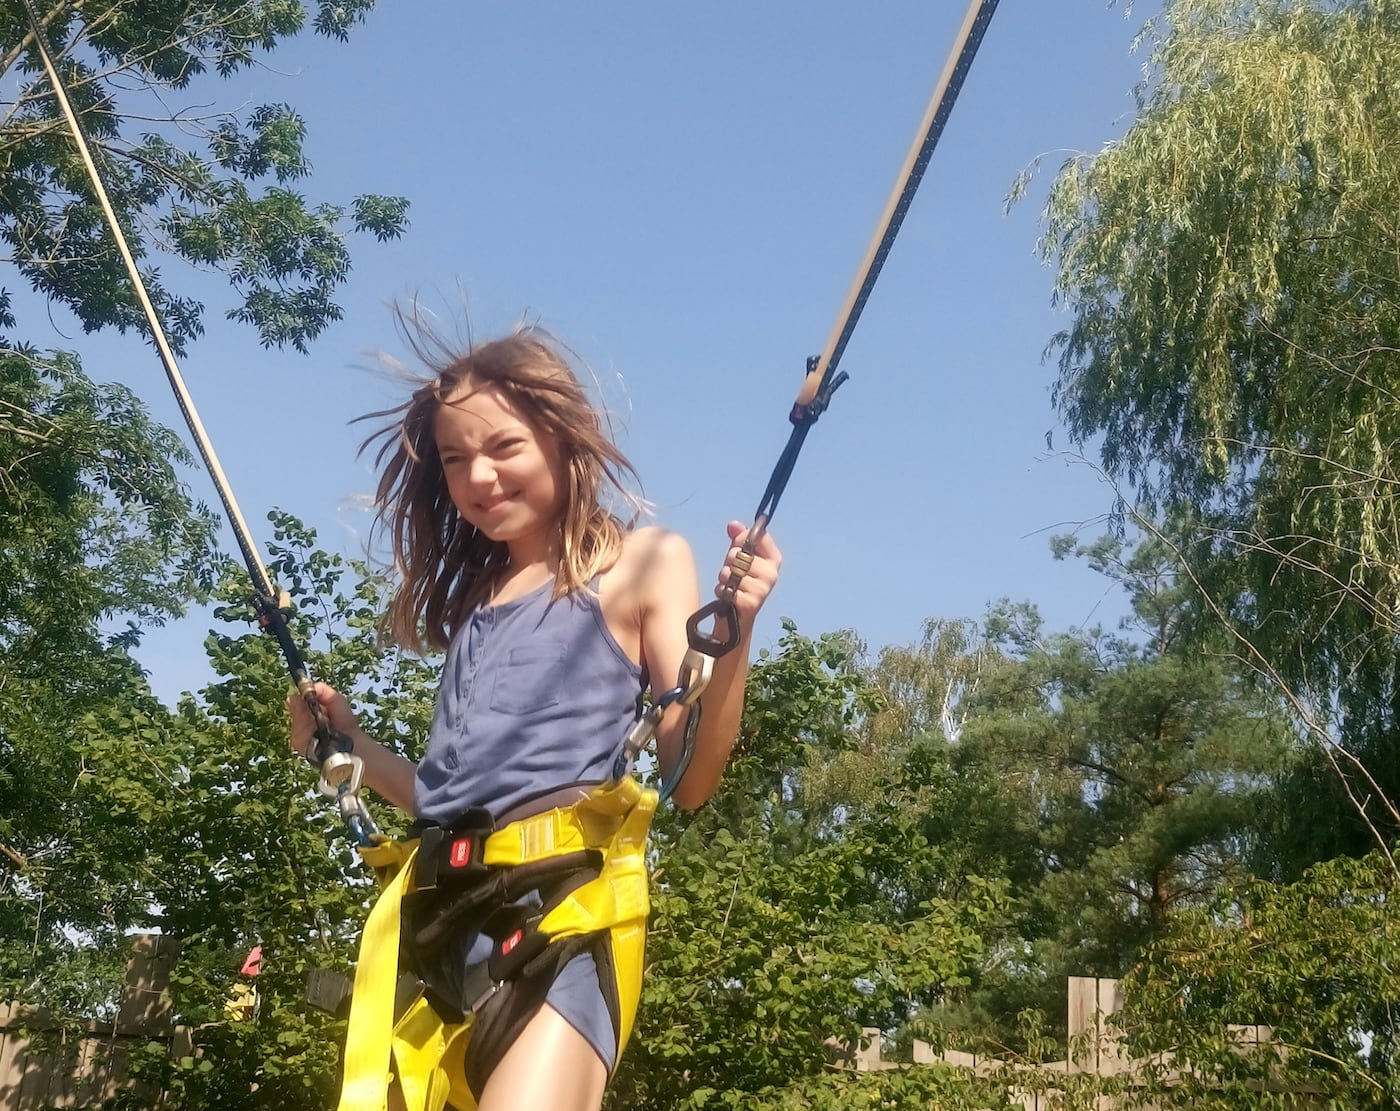 Center Parcs Bispinger Heide Bungee Jumping Urlaub mit Kind in Berlin Antje Kölling // HIMBEER